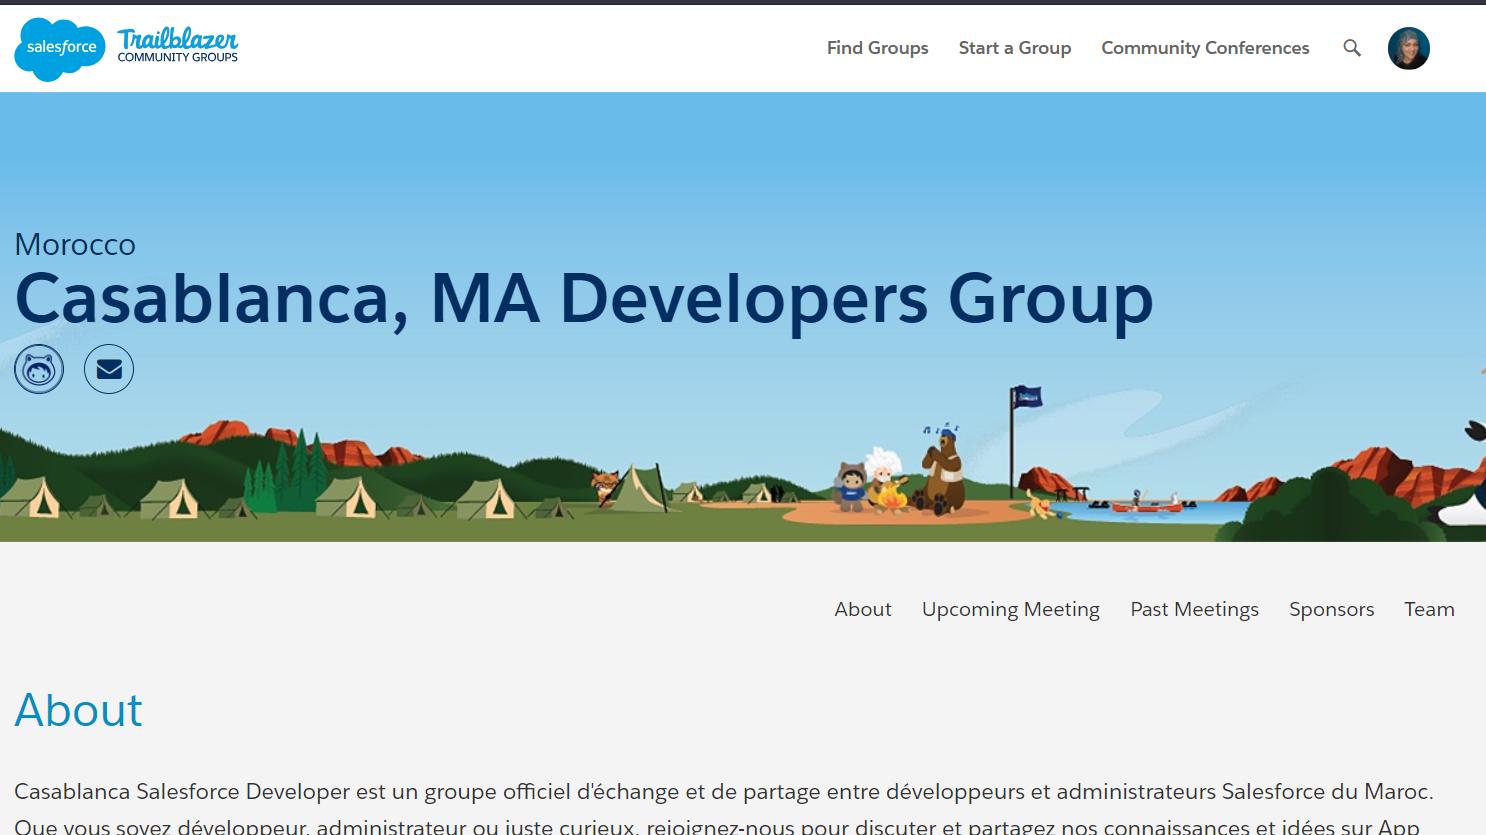 Casablanca Salesforce Developer Group